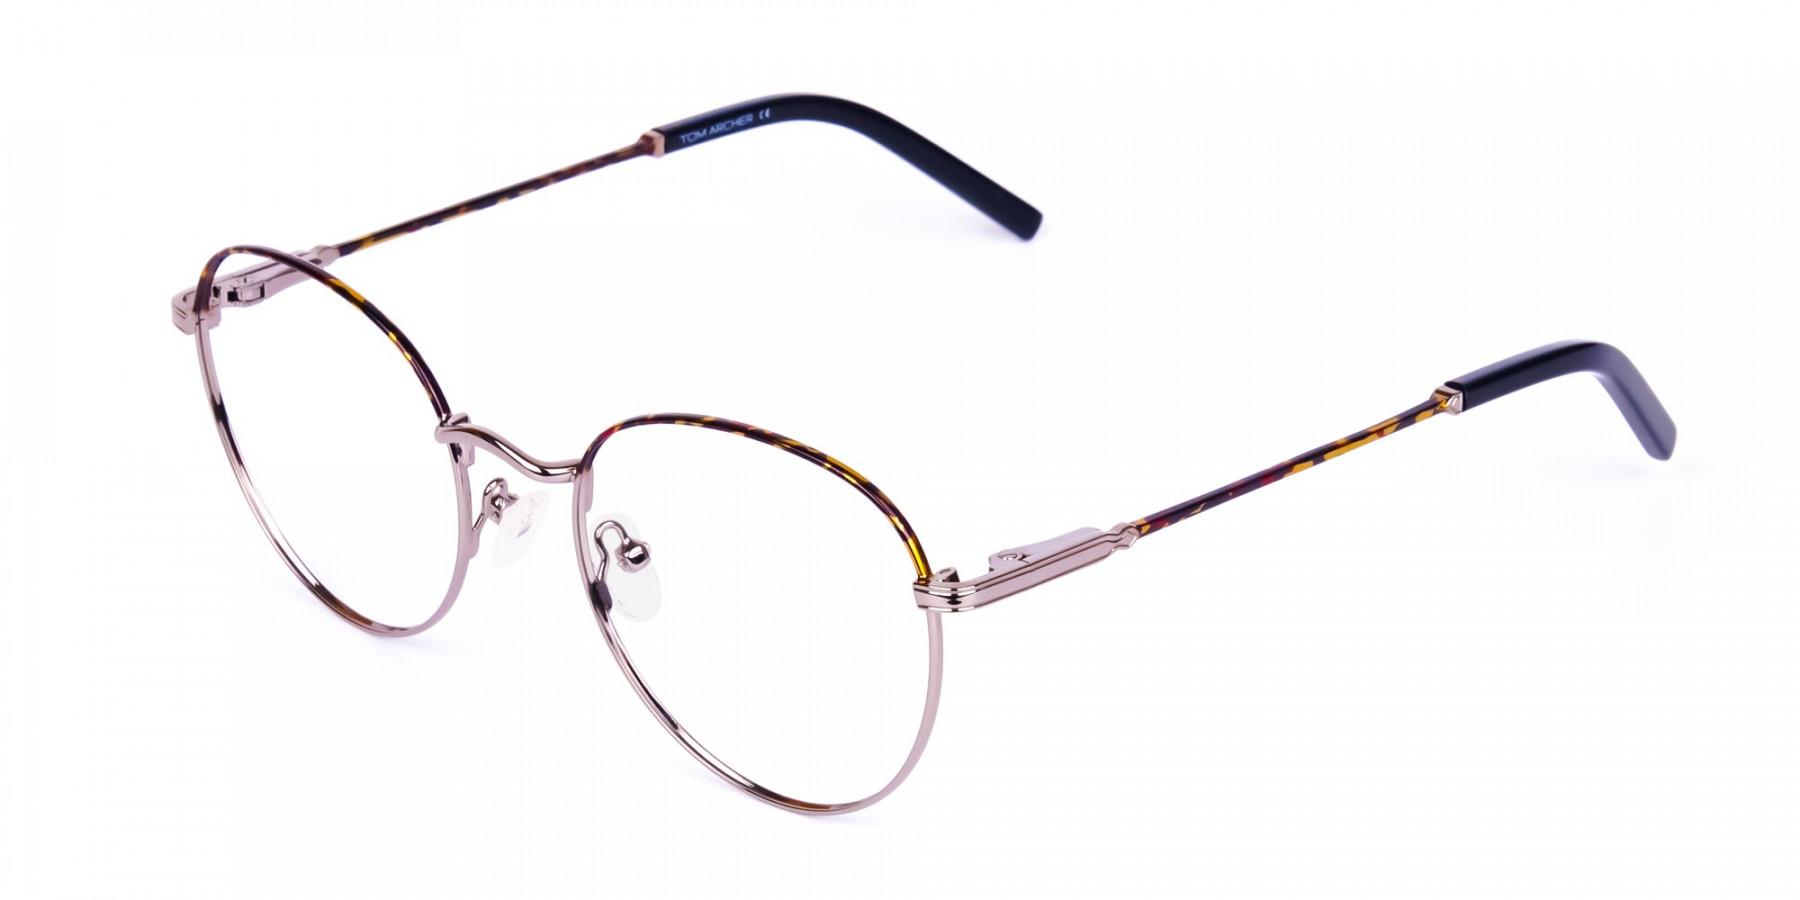 Gunmetal-Round-Tortoise-Shell-Glasses-1